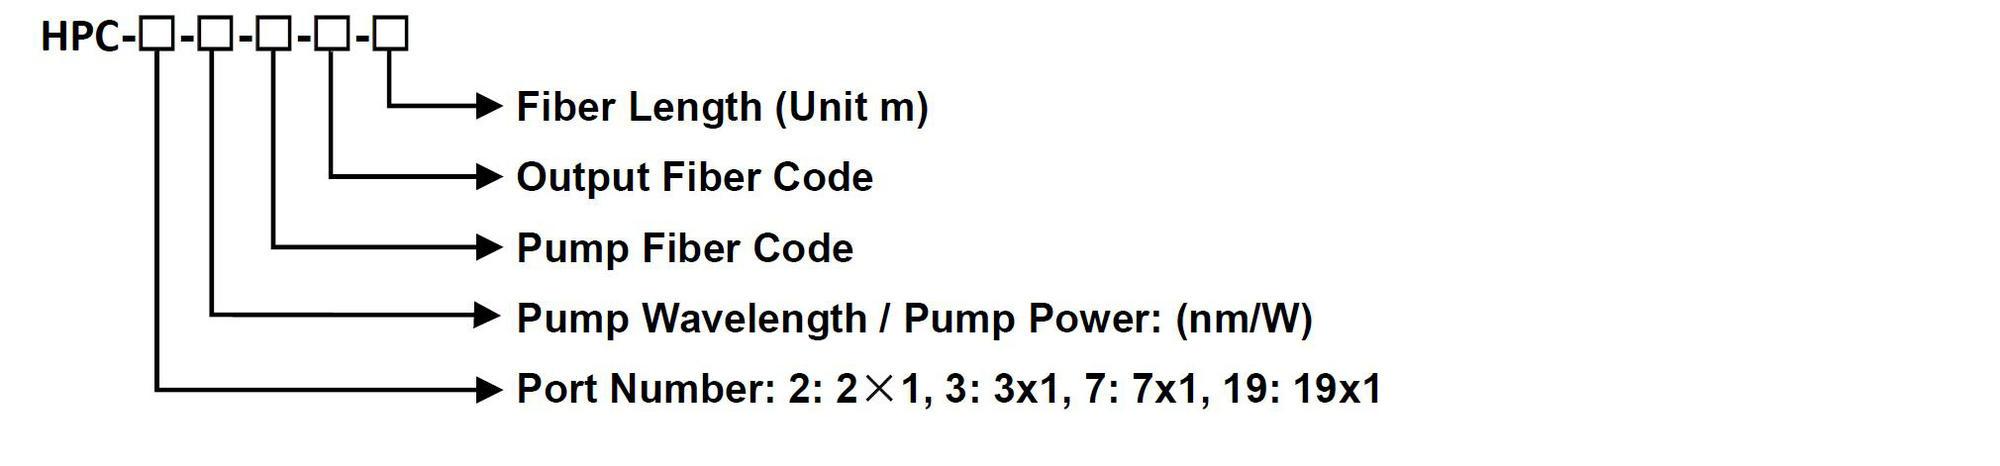 1.6.1 Nx1 High-Power Beam Combiner